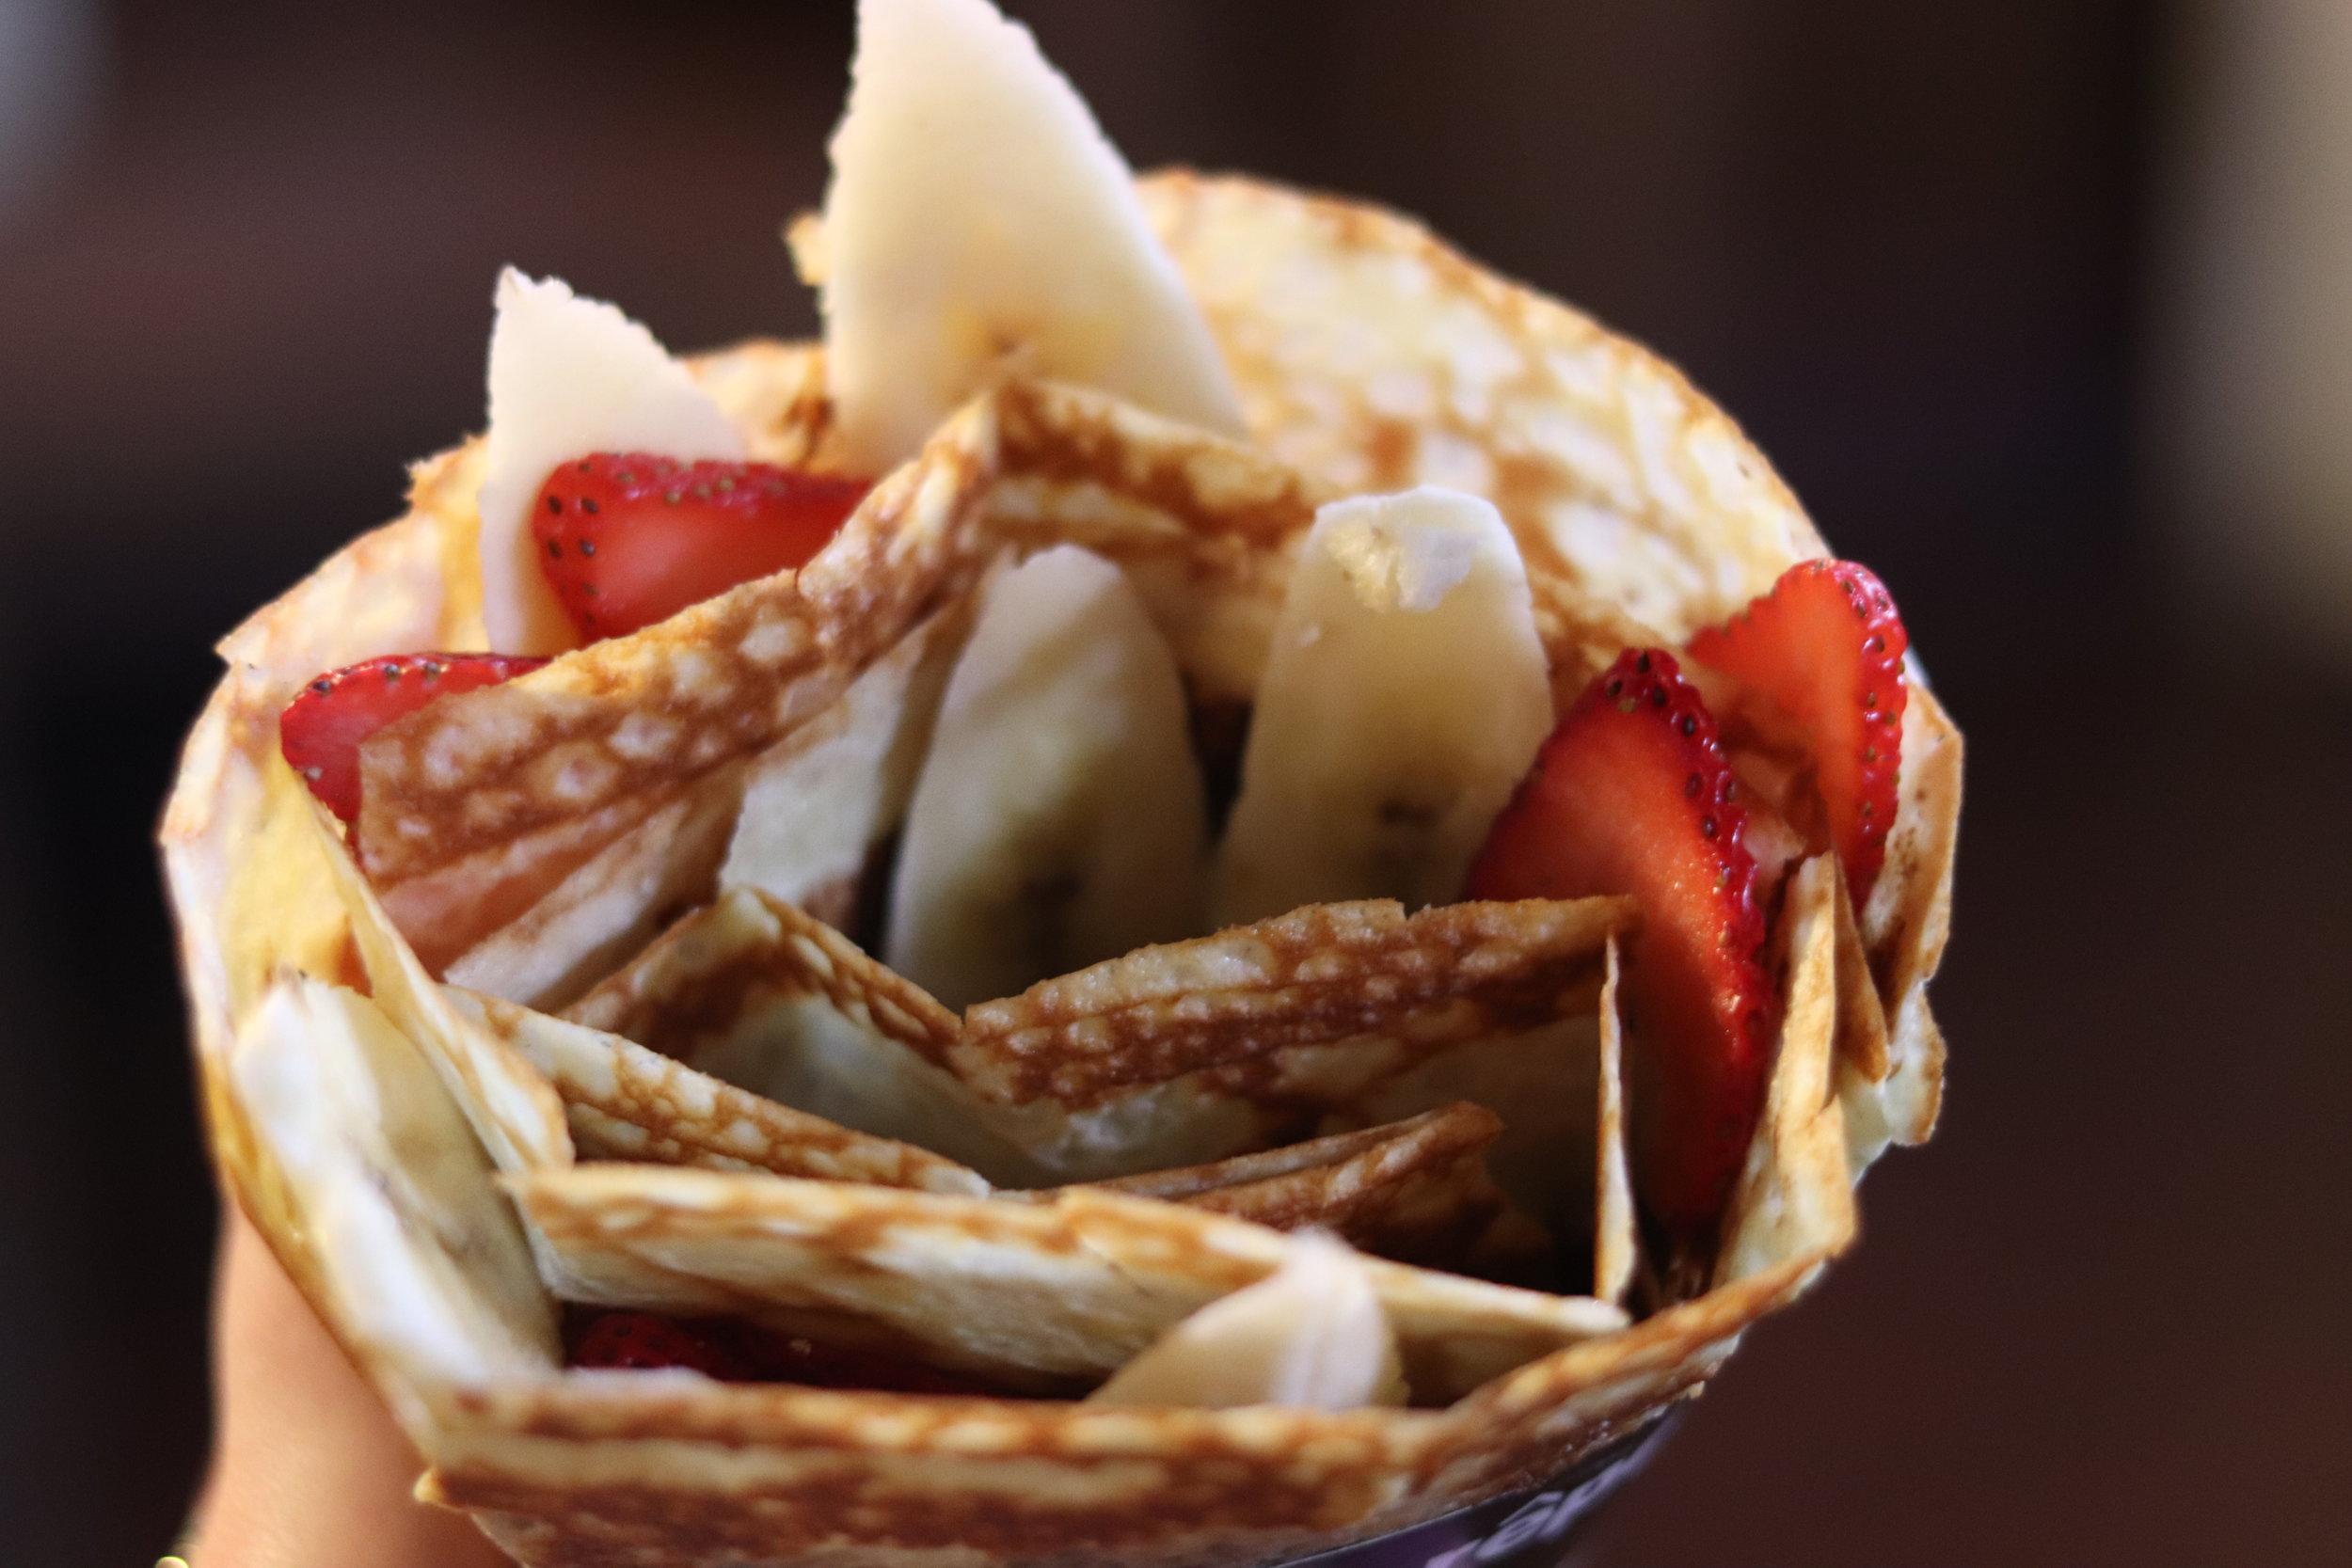 Strawberry banana nutella crepe